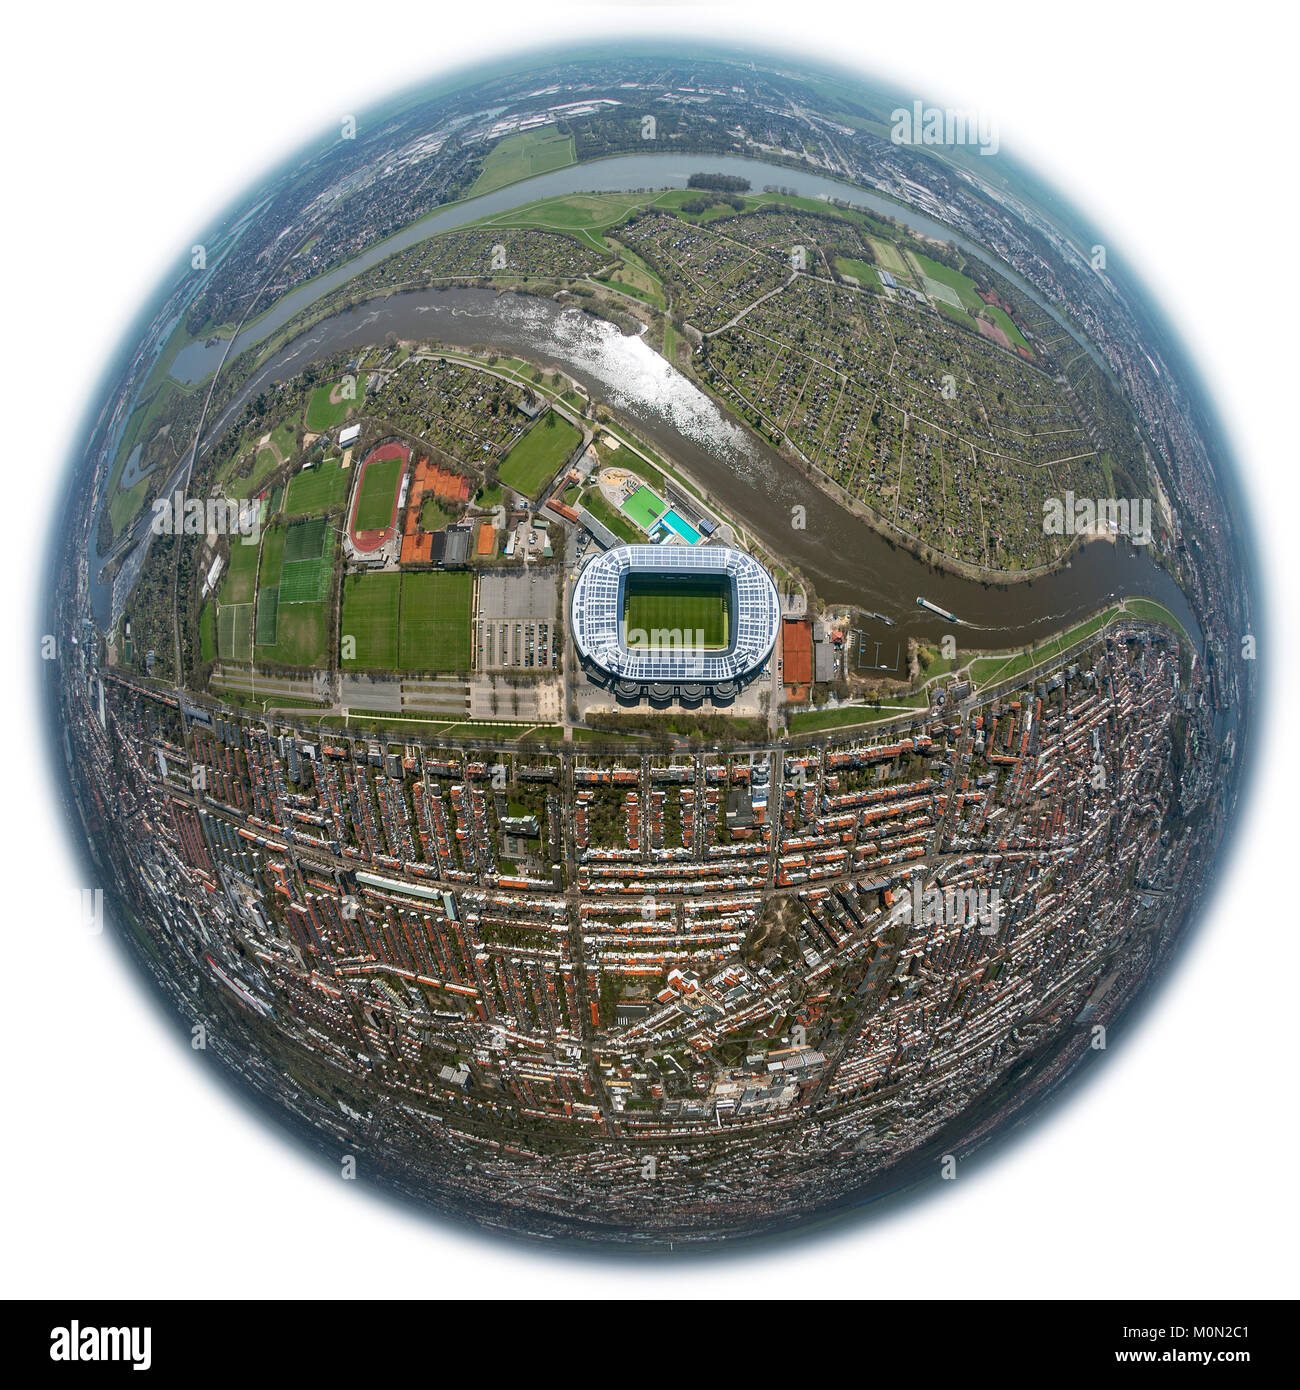 Weser stadium of SV Werder Bremen GmbH & Co. KGaA, Bundesliga, club, fish eye lens, solar roof, Stadium football - Stock Image